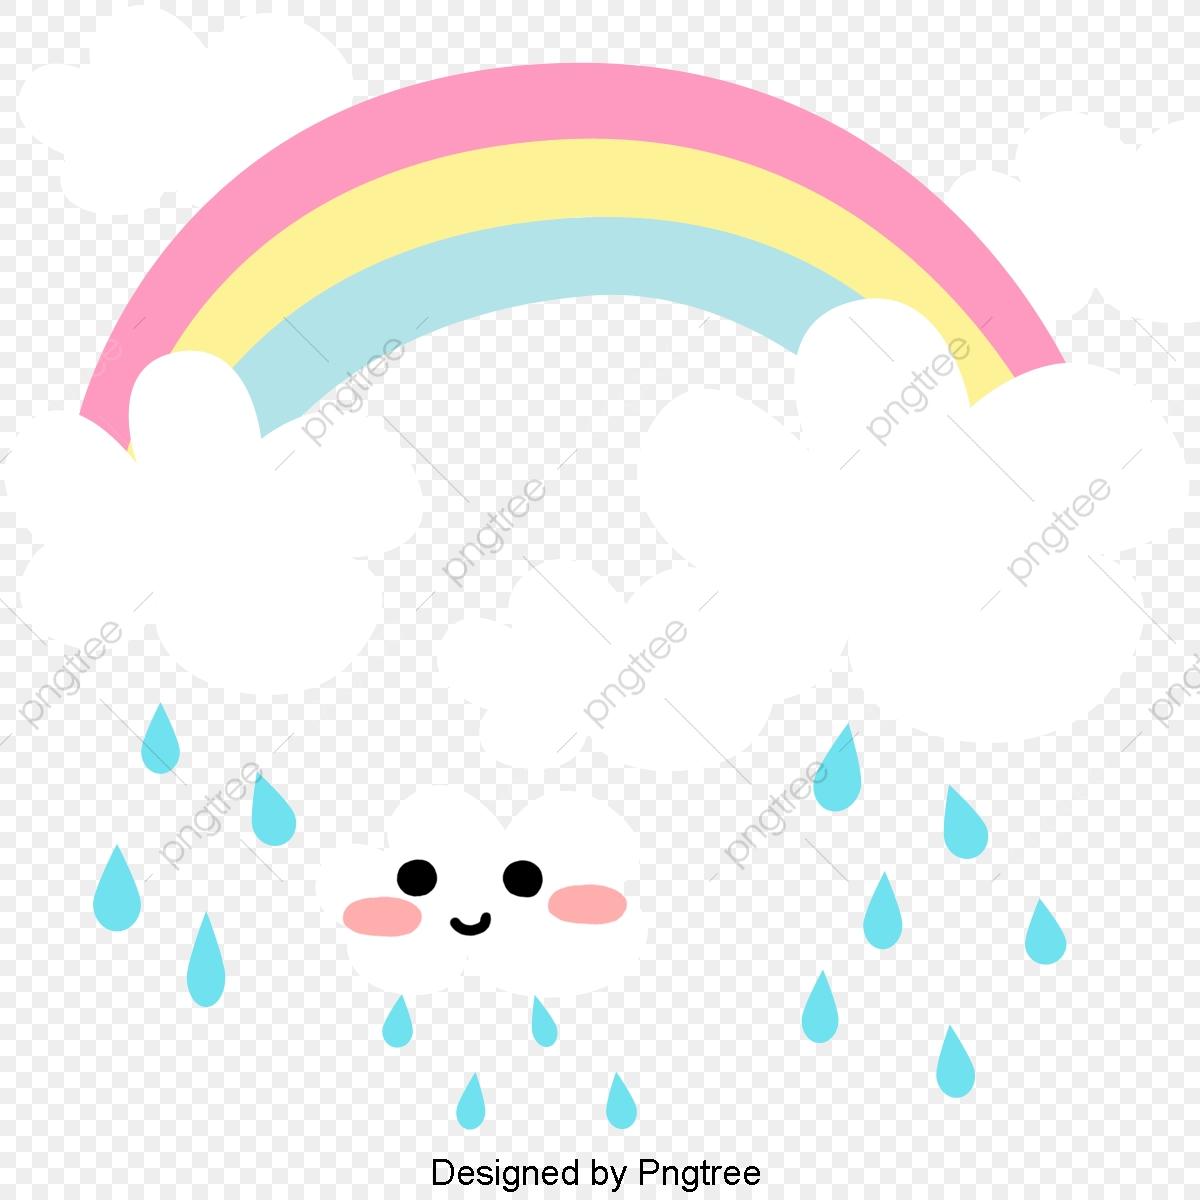 Raindrop clipart painted. Cartoon hand clouds rain